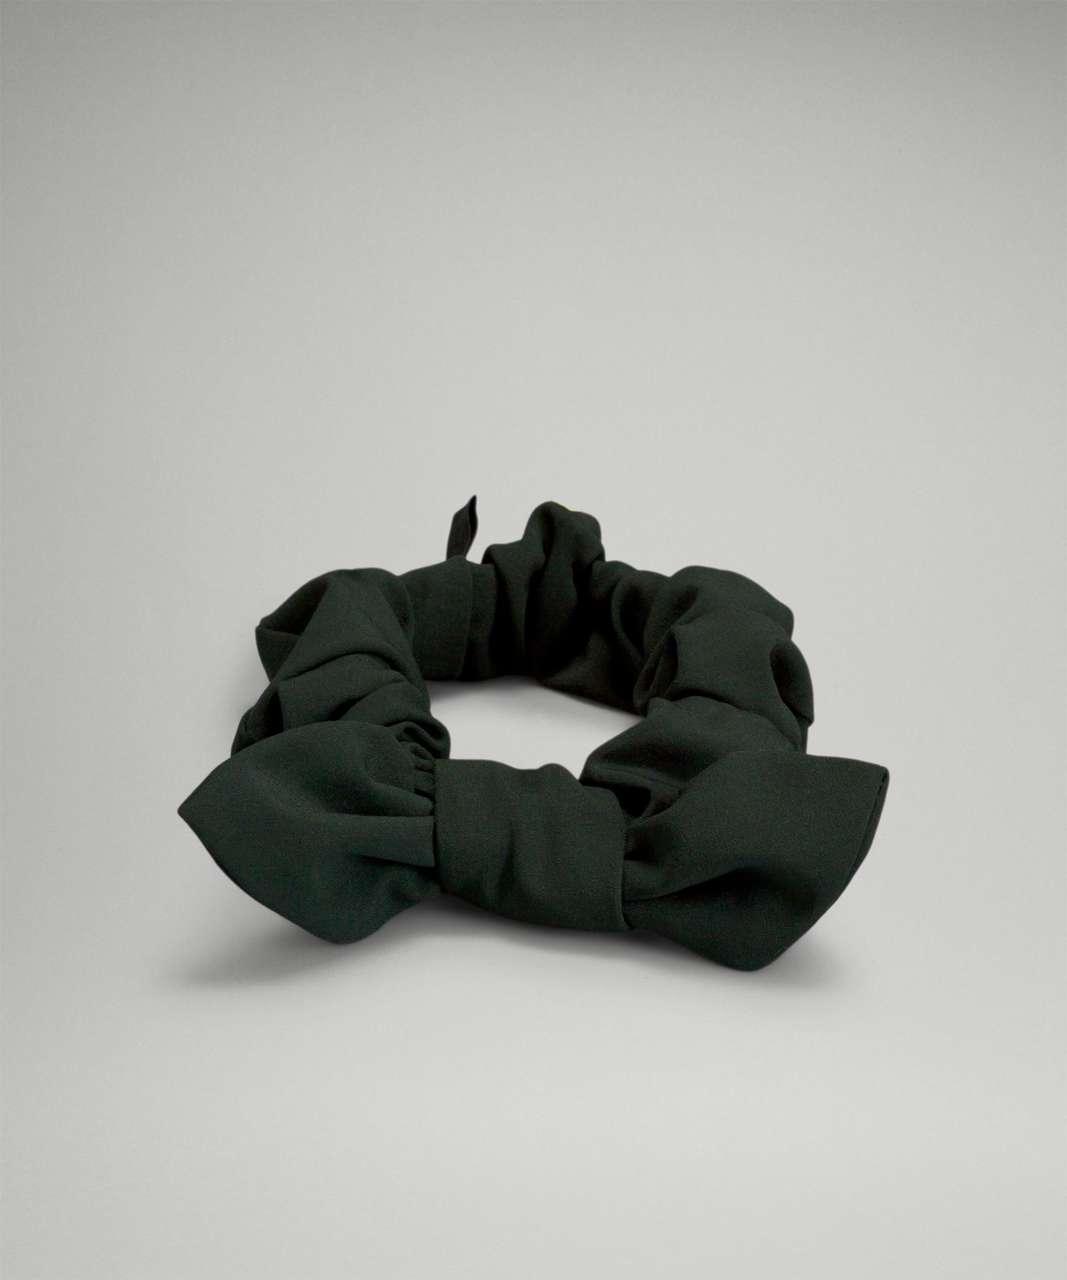 Lululemon Uplifting Scrunchie *Bow - Rainforest Green